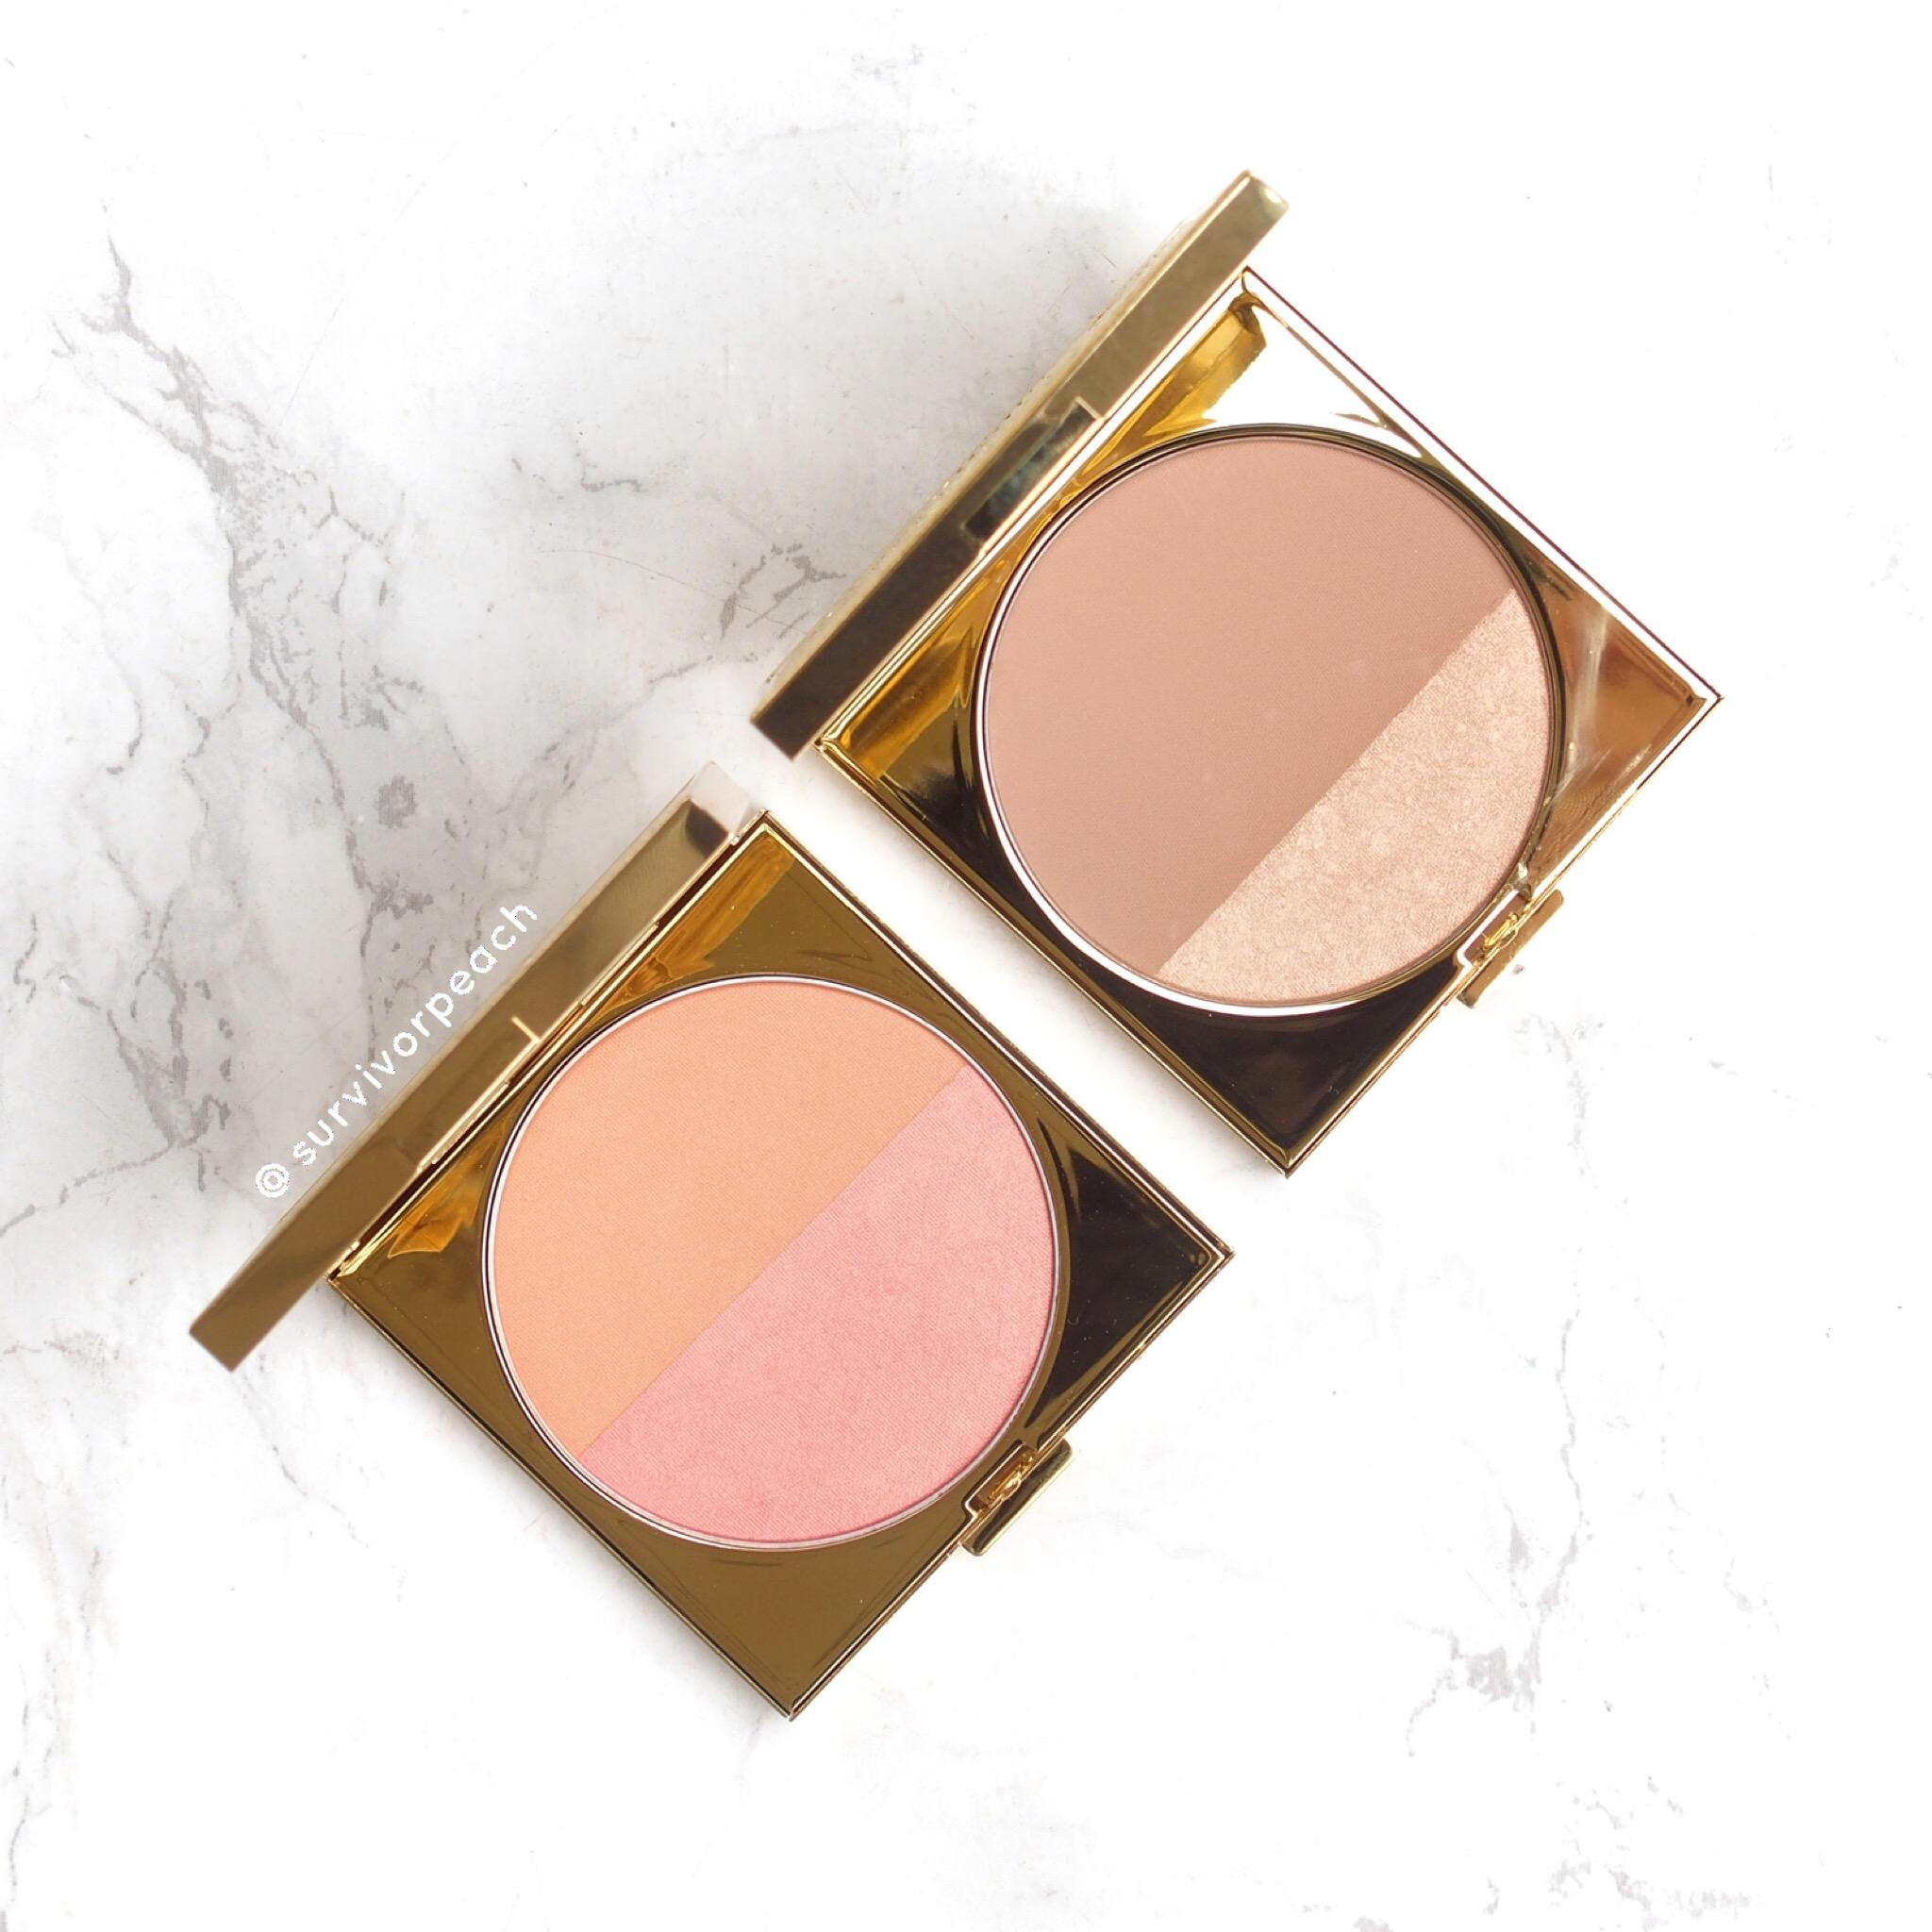 MACxPadma collection powder blush duo